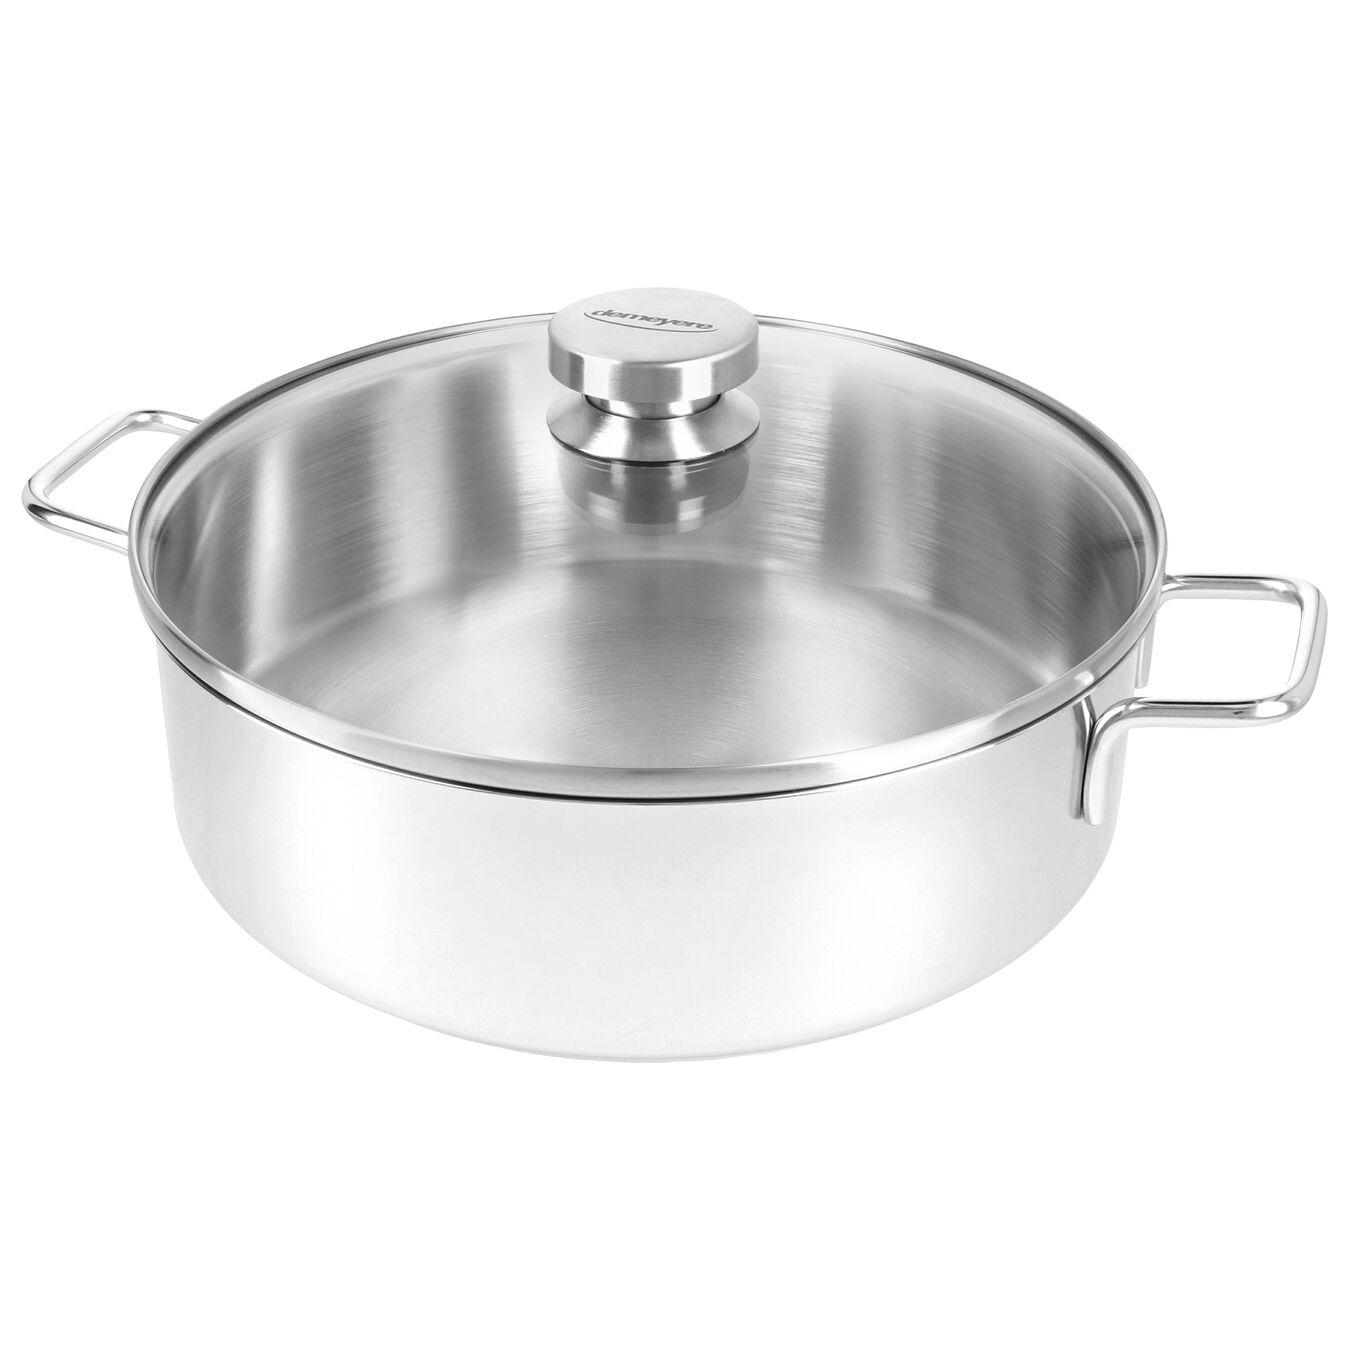 Kookpot met glazen deksel 24 cm / 2,8 l,,large 2